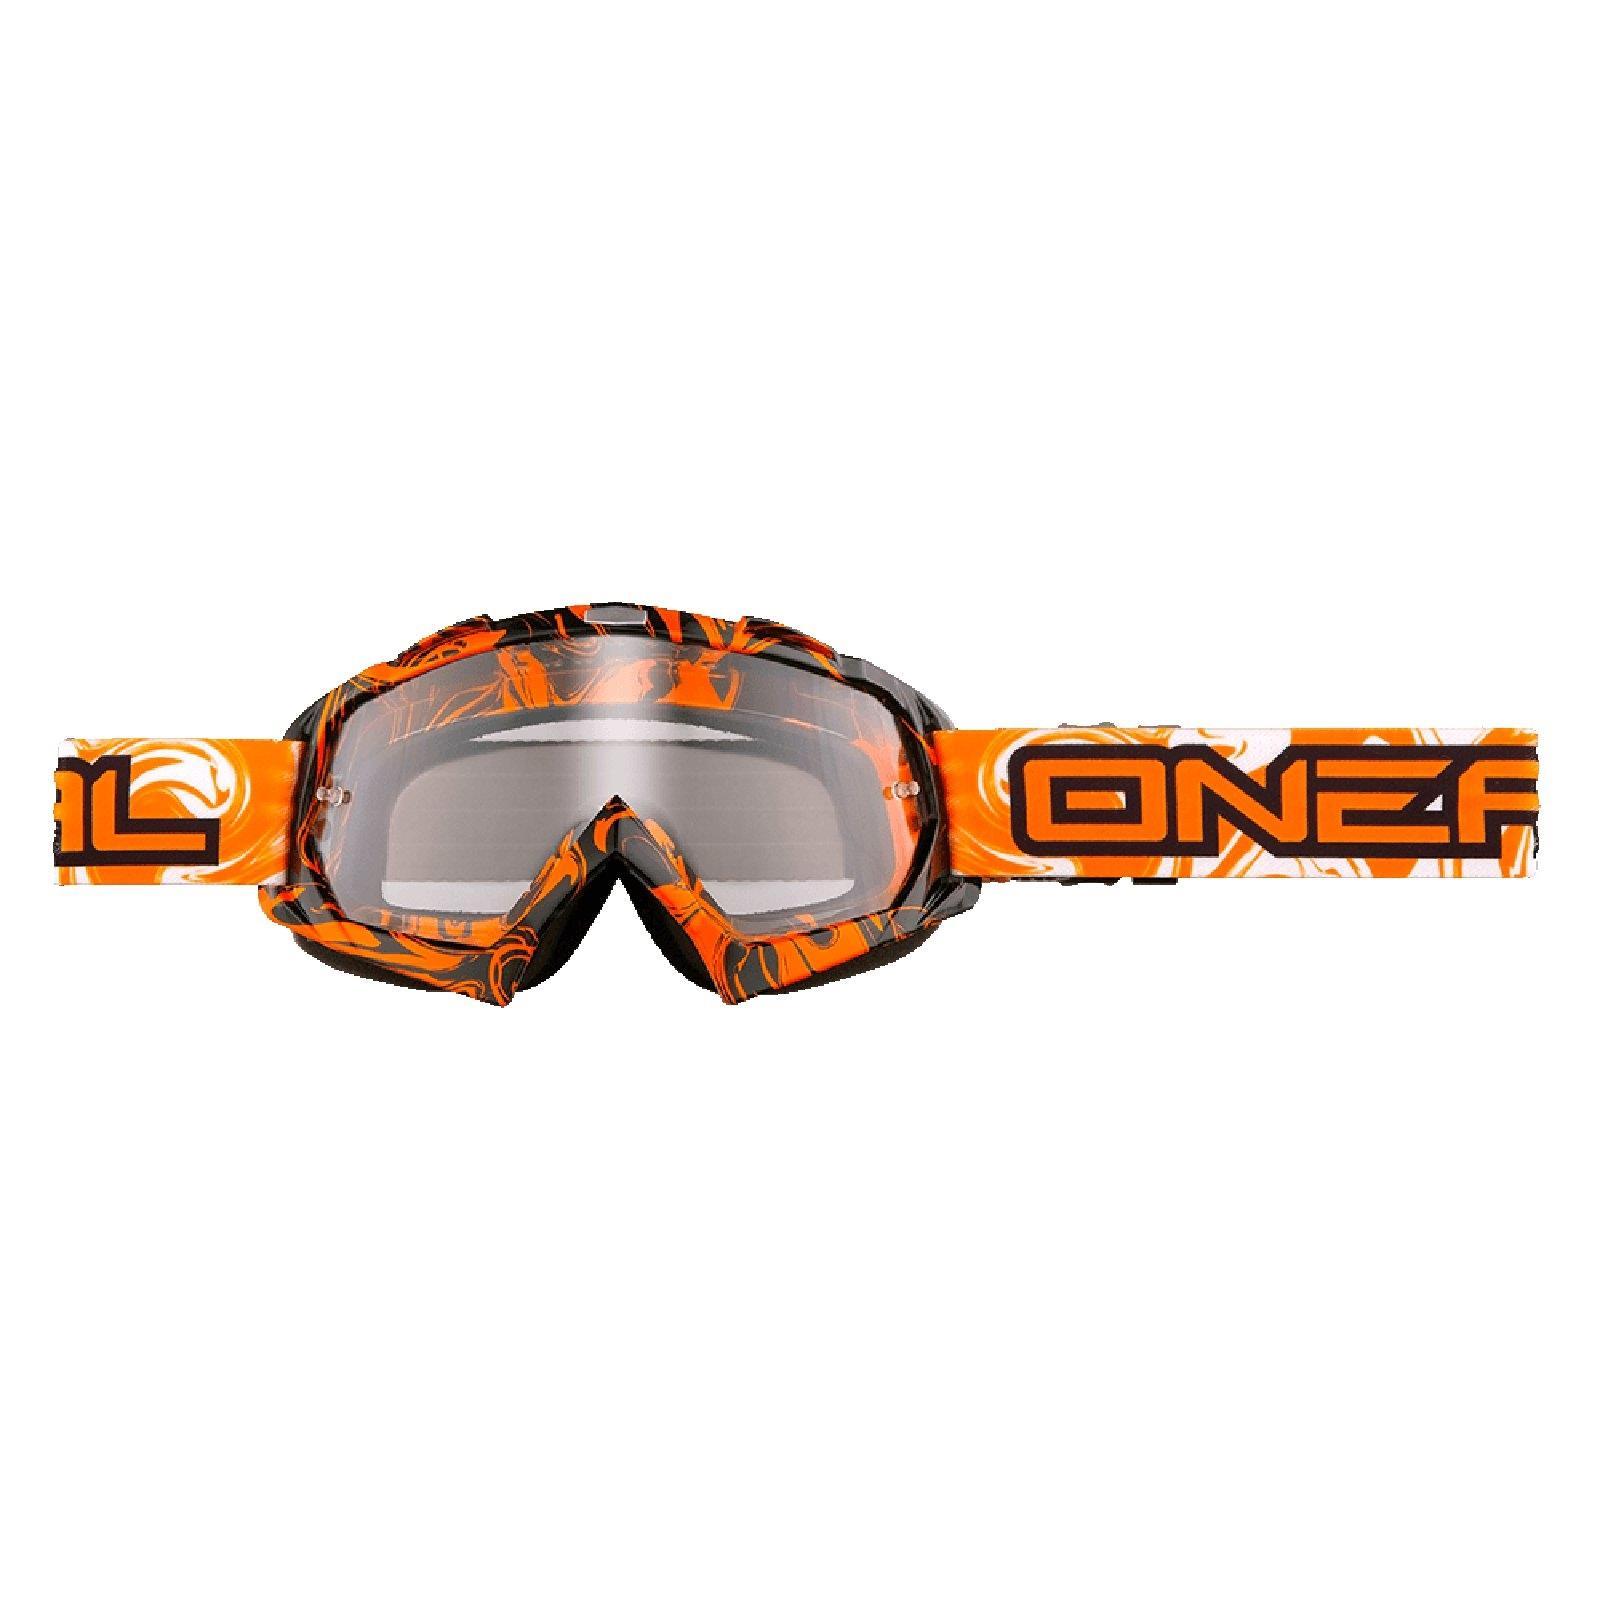 O-039-Neal-B-FLEX-chiaramente-MX-Goggle-Motocross-Occhiali-moto-Downhill-Mountain-Bike-DH miniatura 8